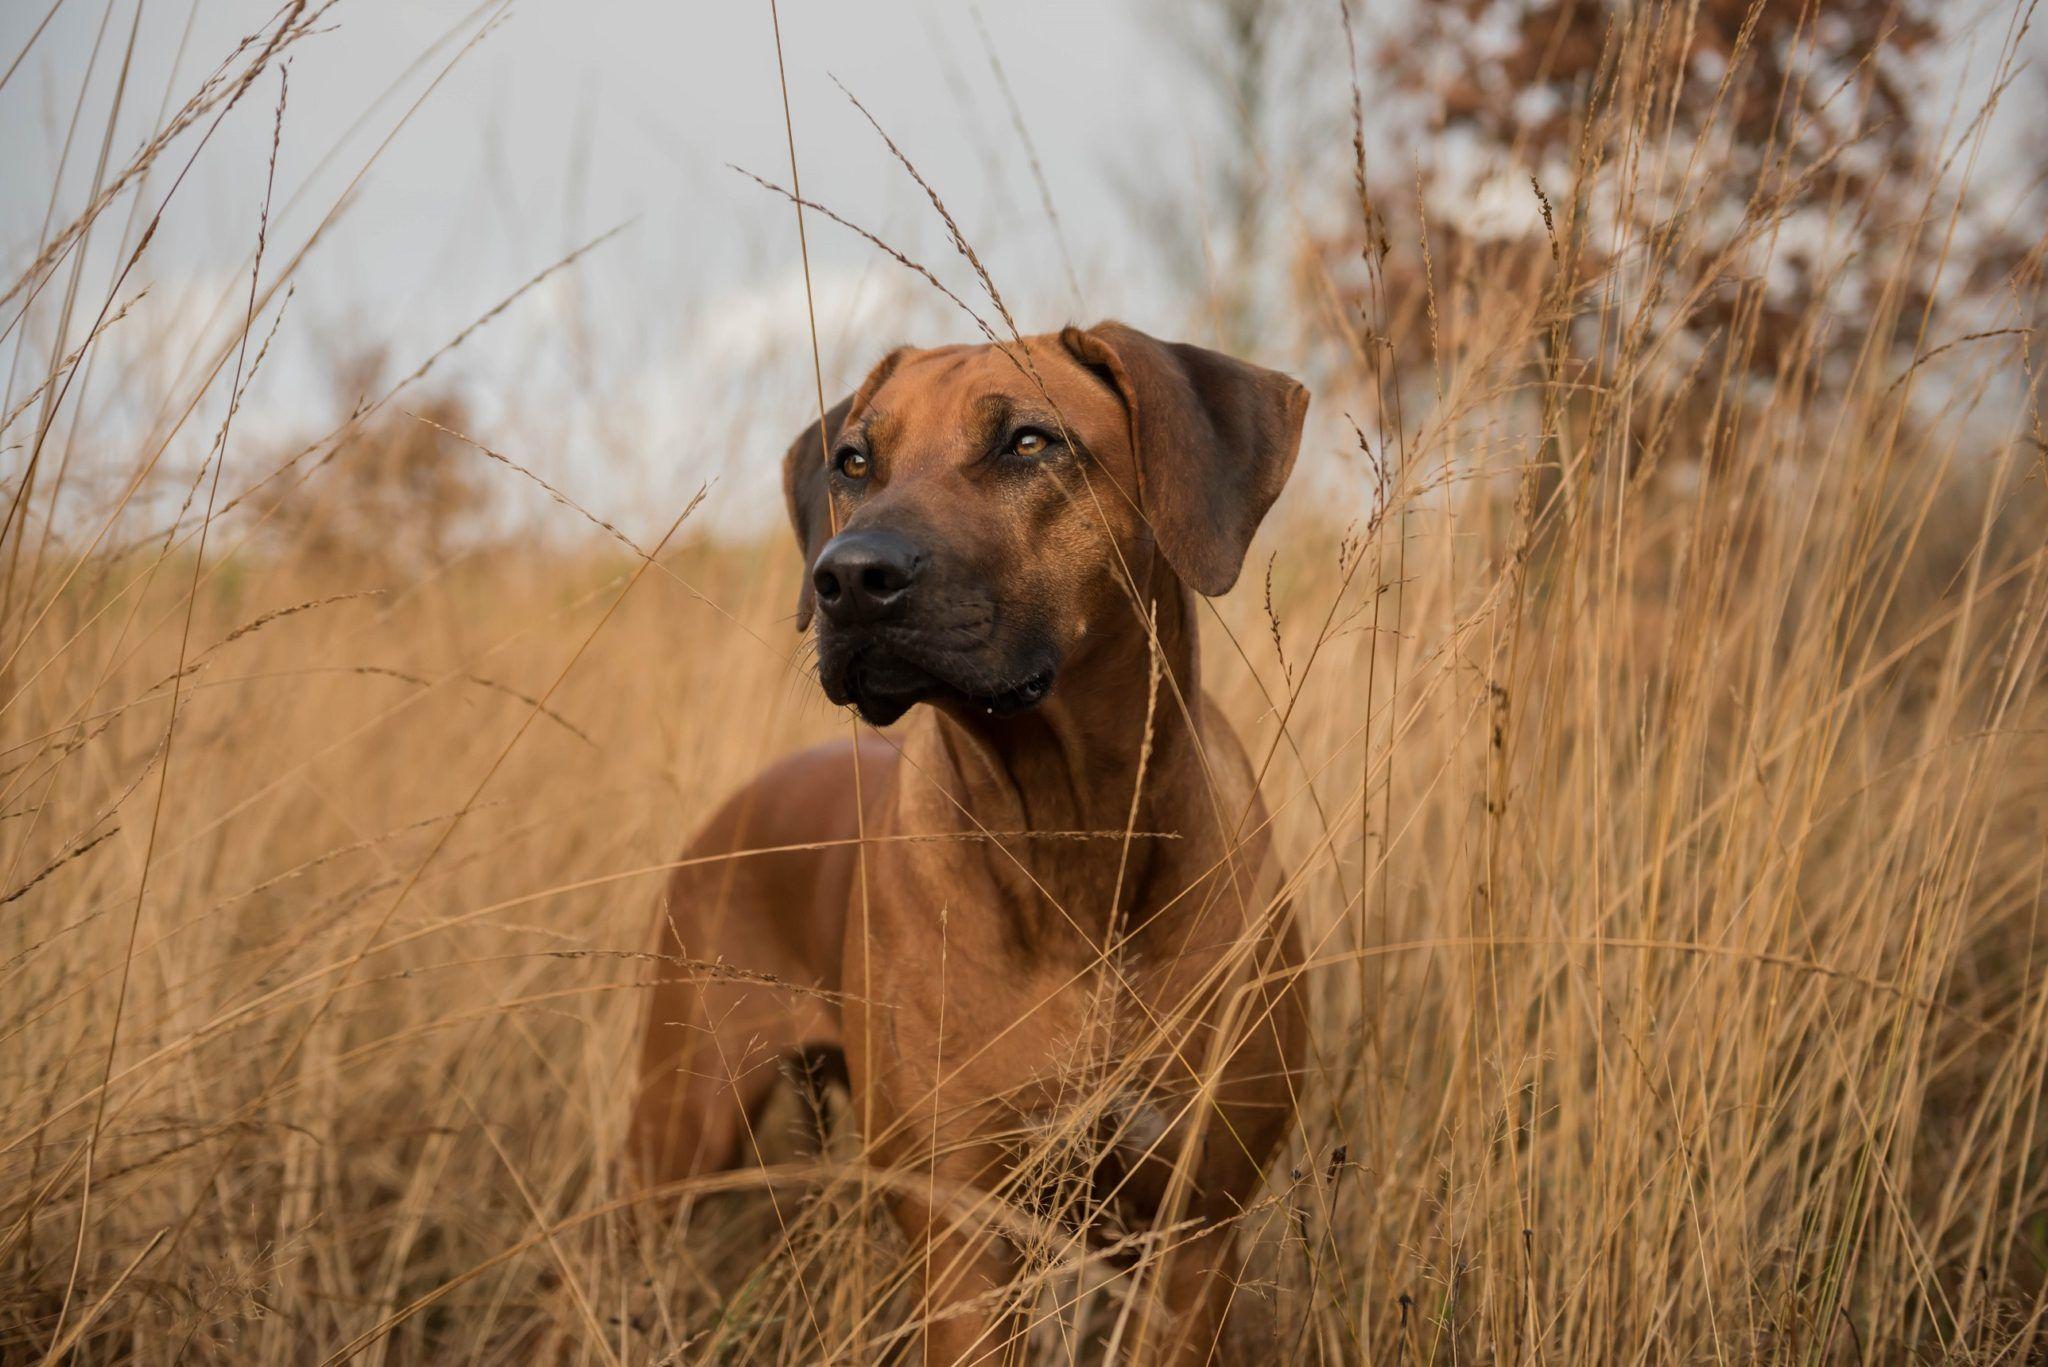 Dkch Shangalia Avani Kamili Rhodesian Ridgeback Dogs Kennel